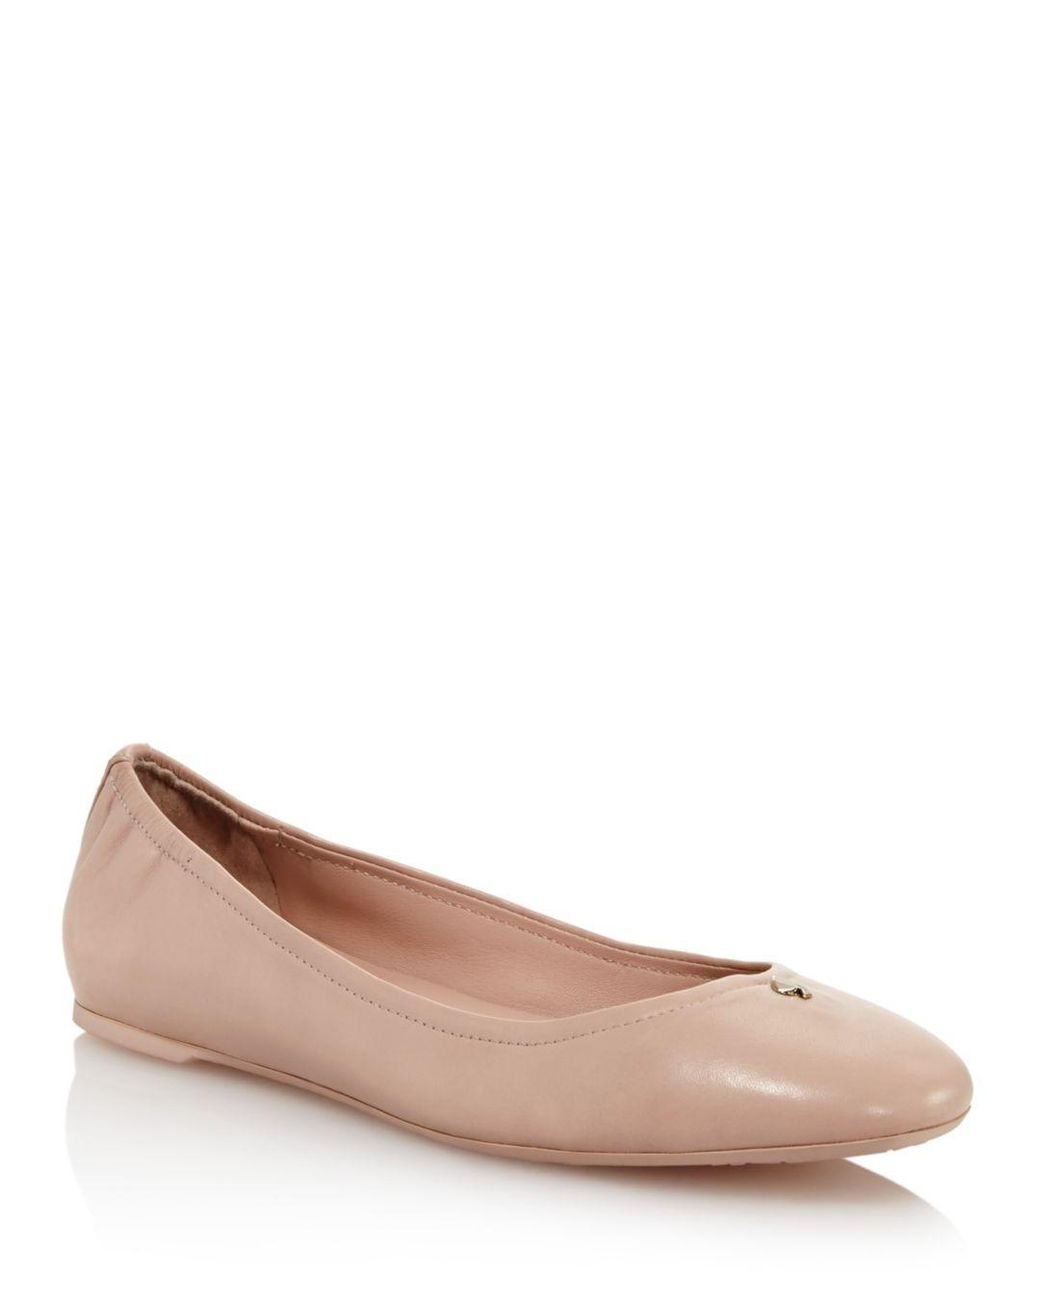 211e42df46f7 Lyst - Kate Spade Kora Ballet Flats - Save 28%